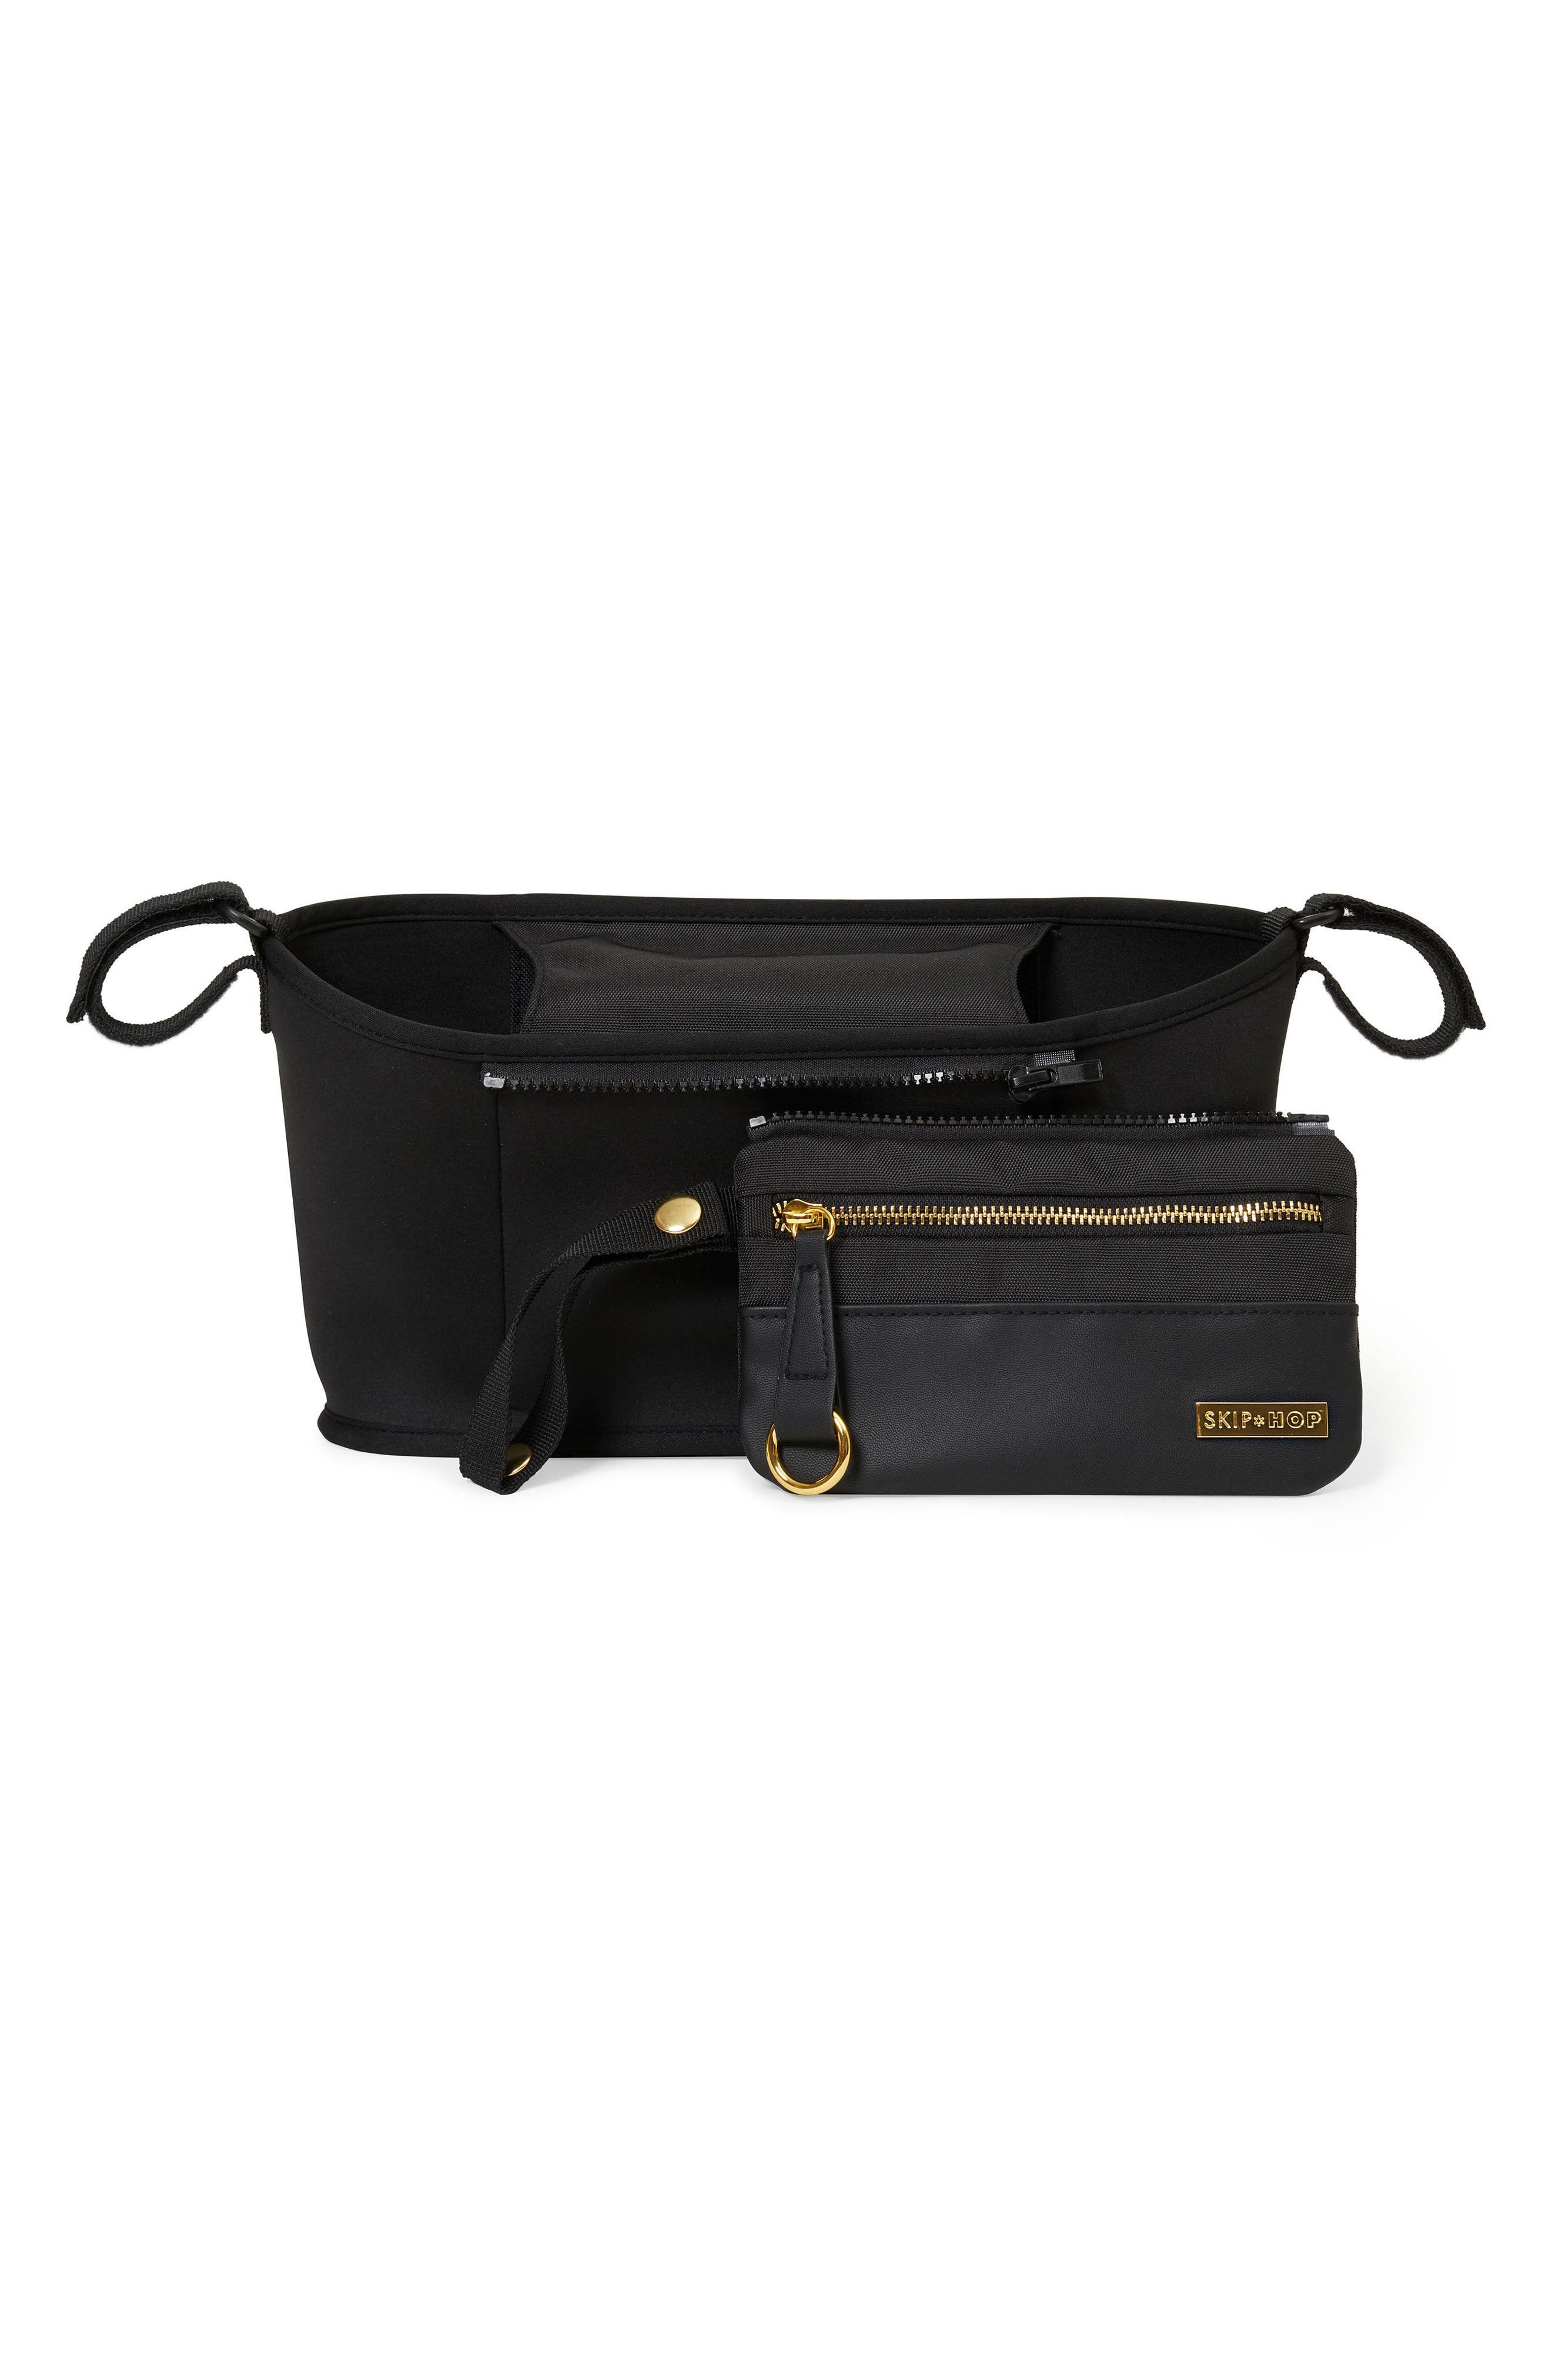 Grab & Go Luxe Stroller Organizer,                         Main,                         color, Black